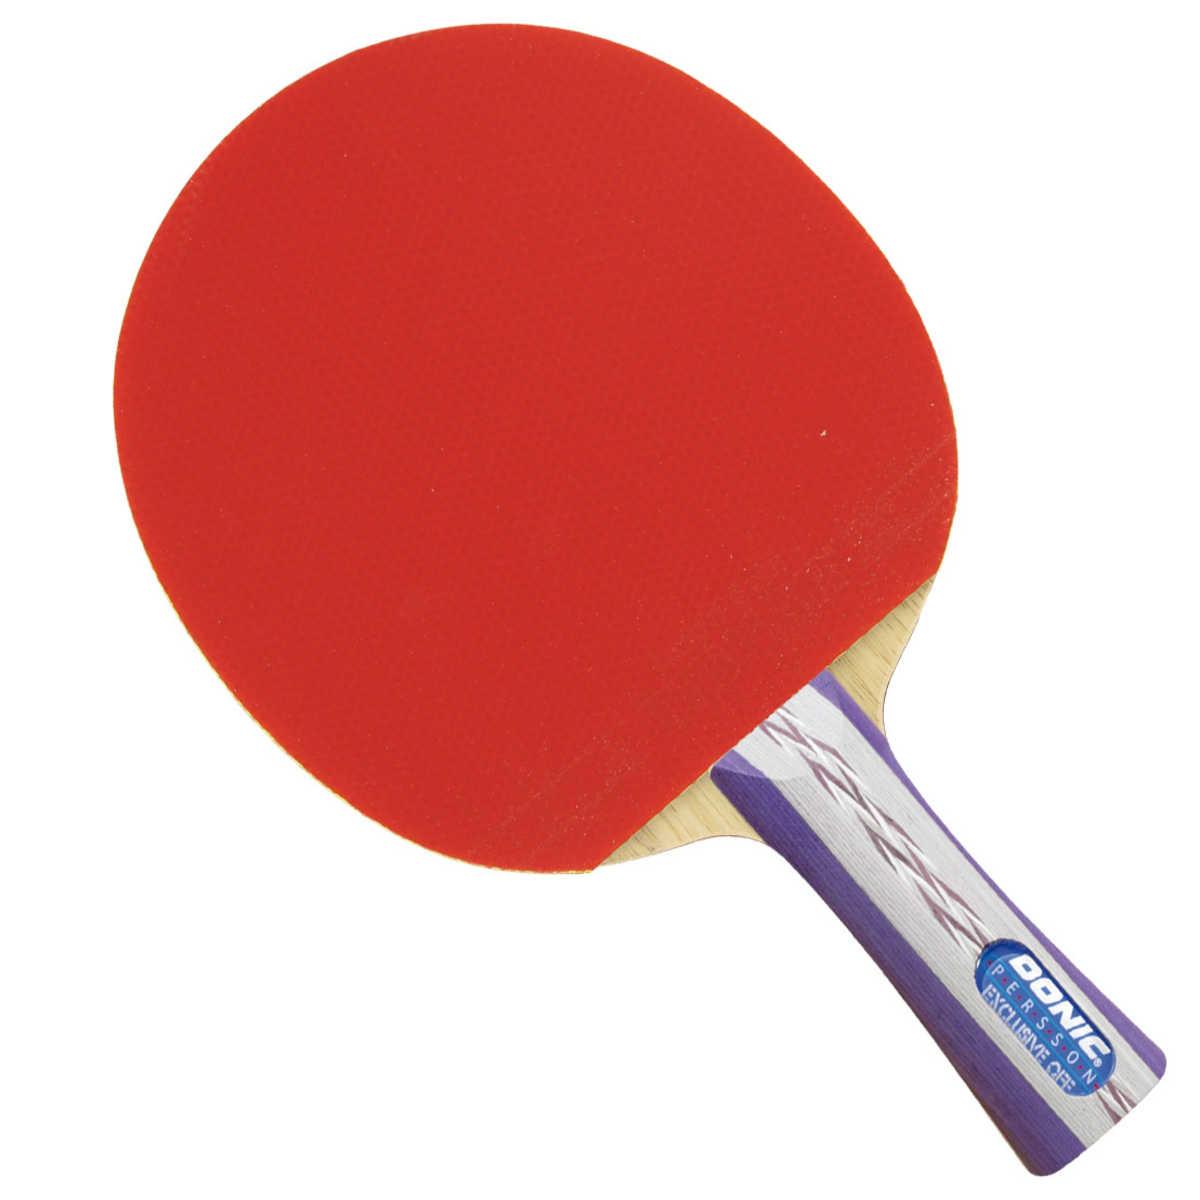 Donic tennis de table raq persson exclusif off liga 1 - Choisir raquette tennis de table ...